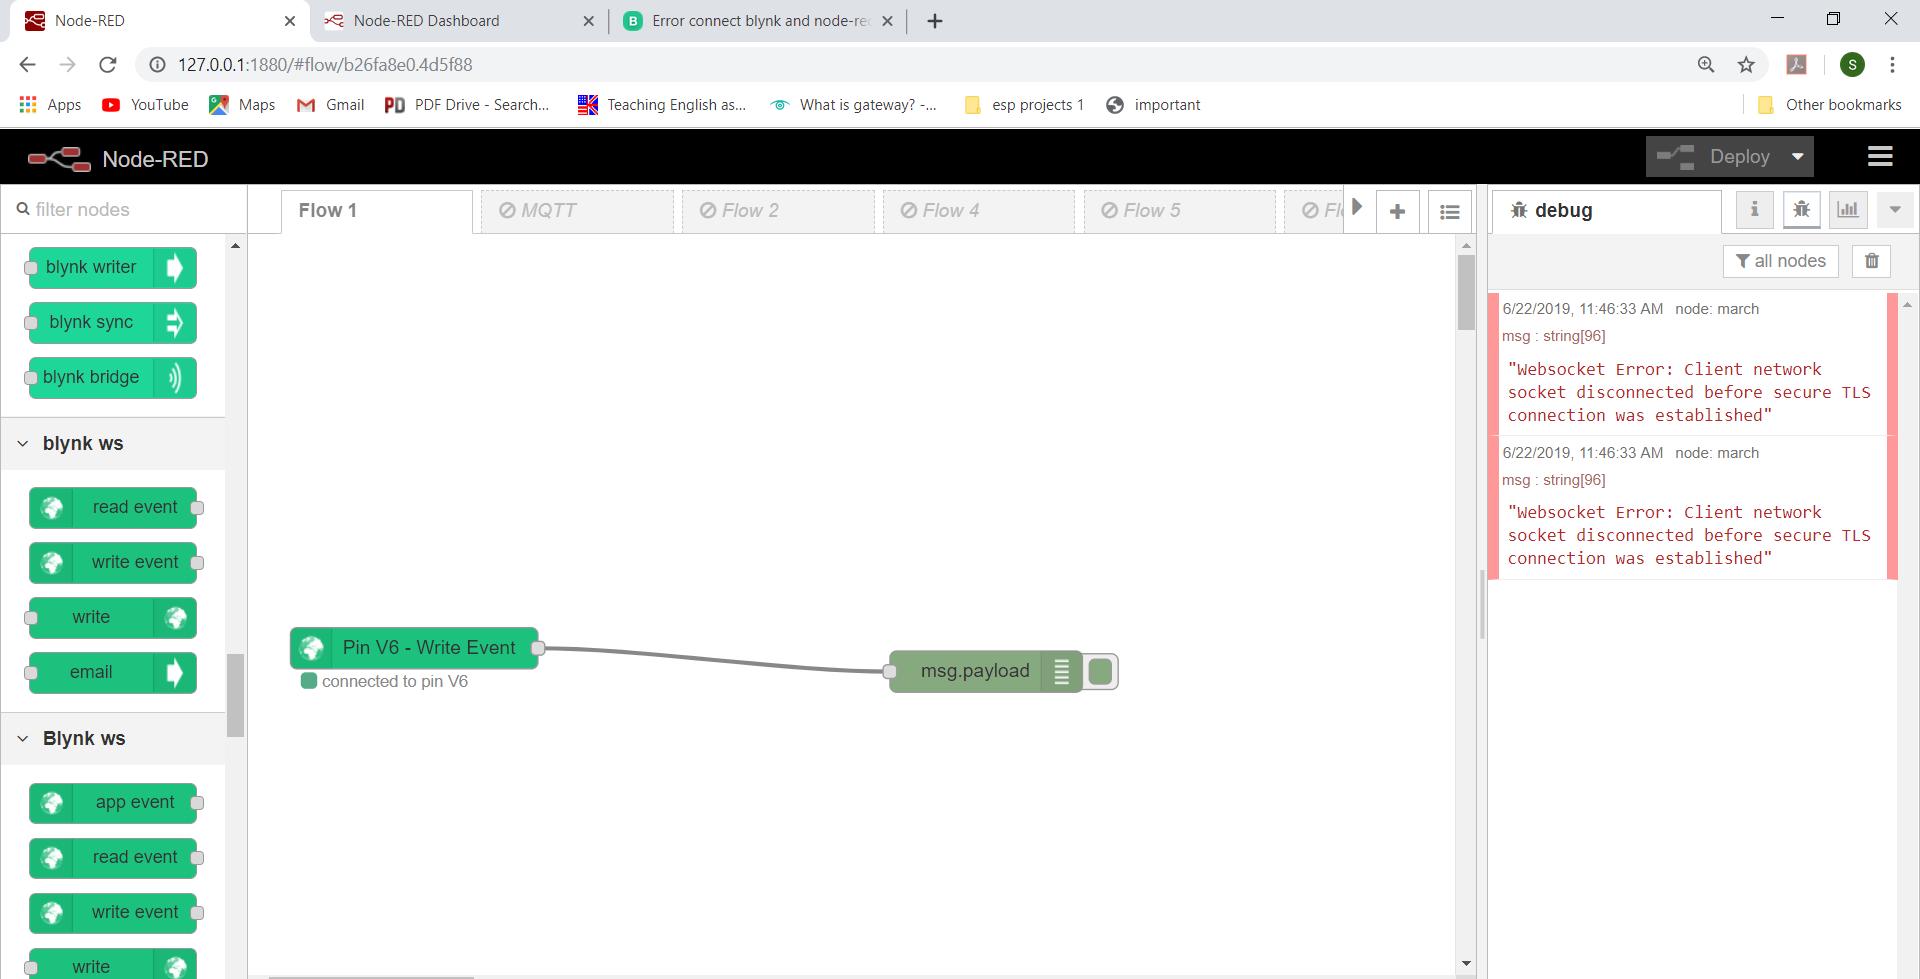 Error connect blynk and node-red - Solved - Blynk Community